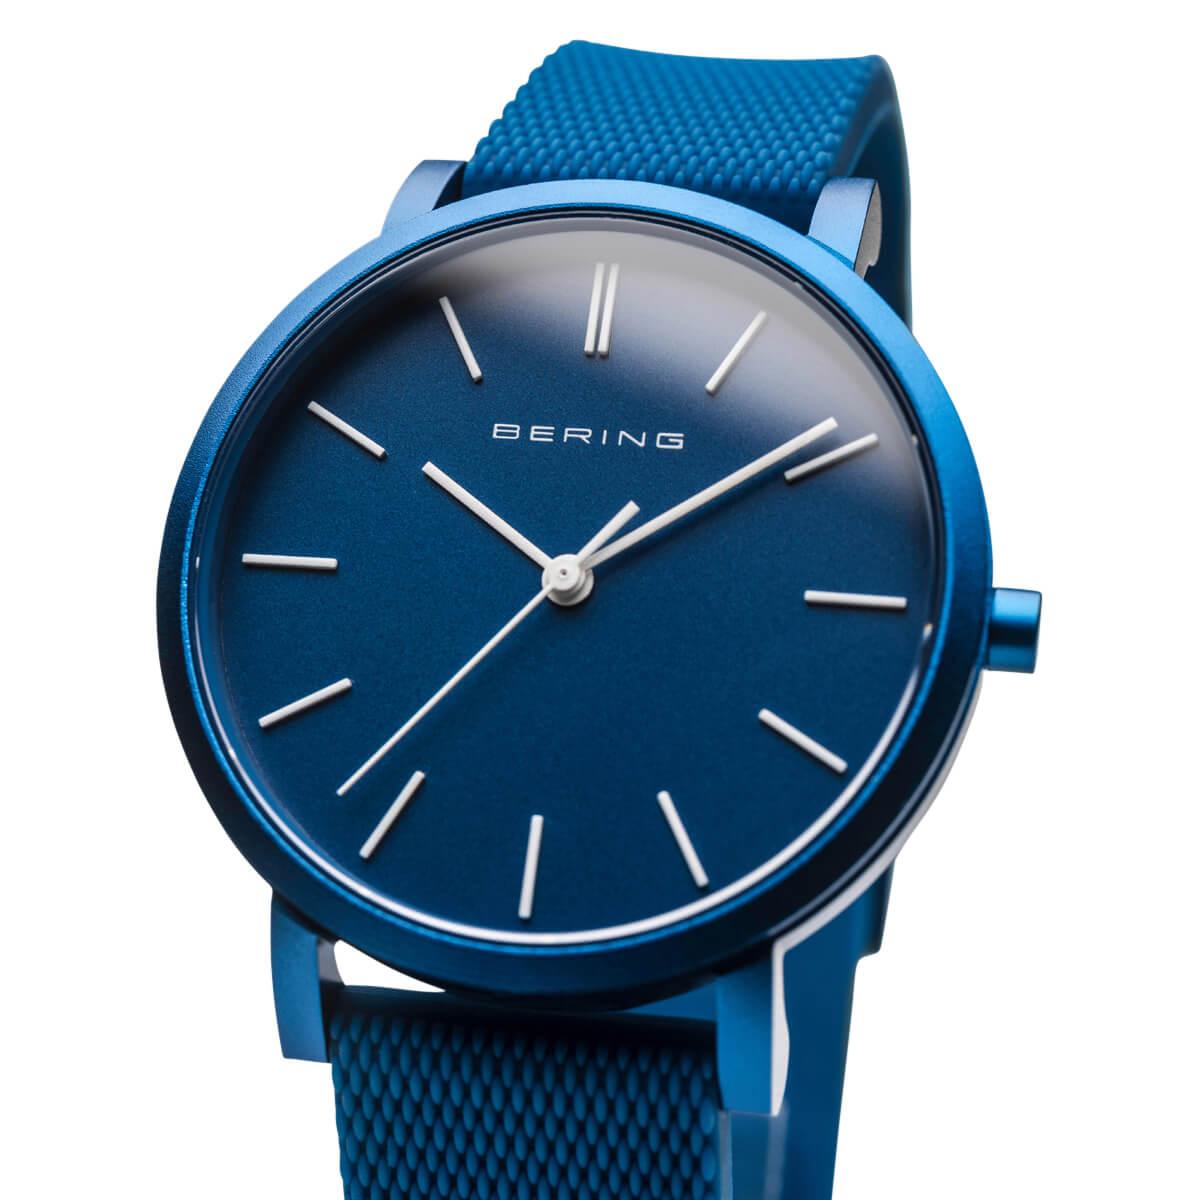 Bering Blue Analogue Women's Watch – 16934-799(2)